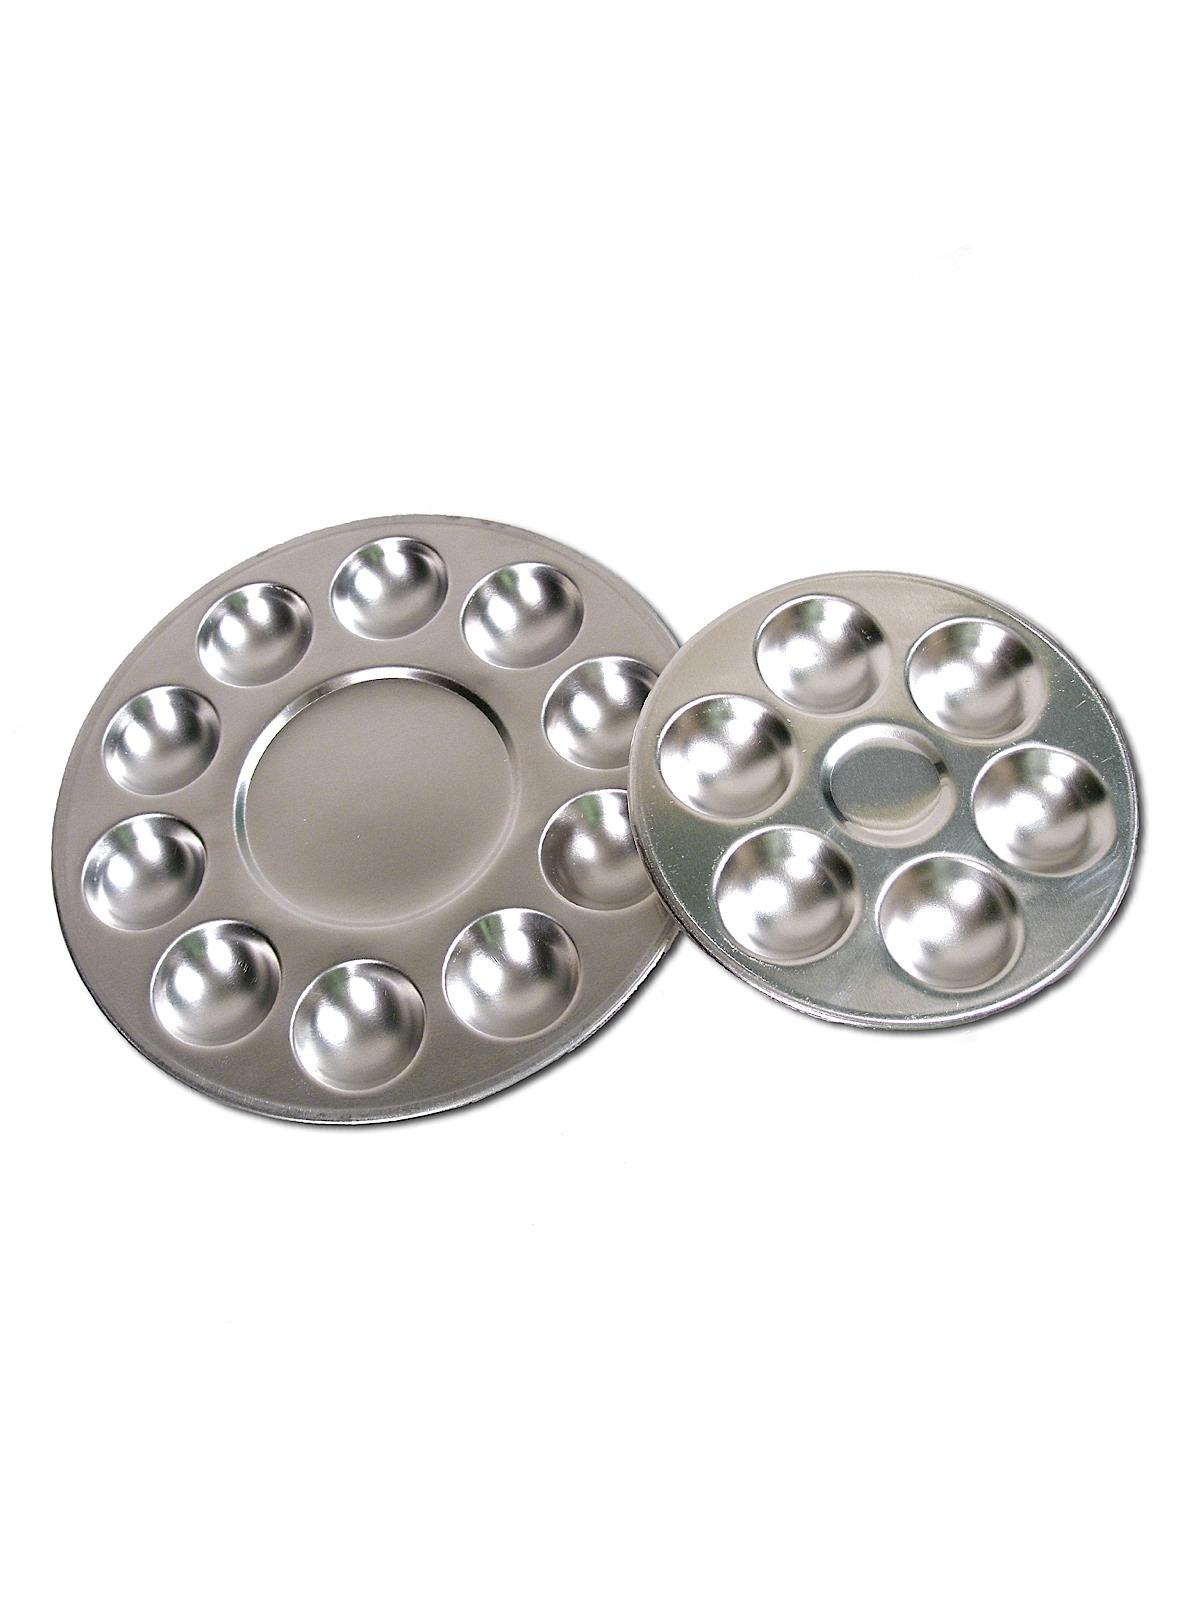 Round Aluminum Mixing Trays